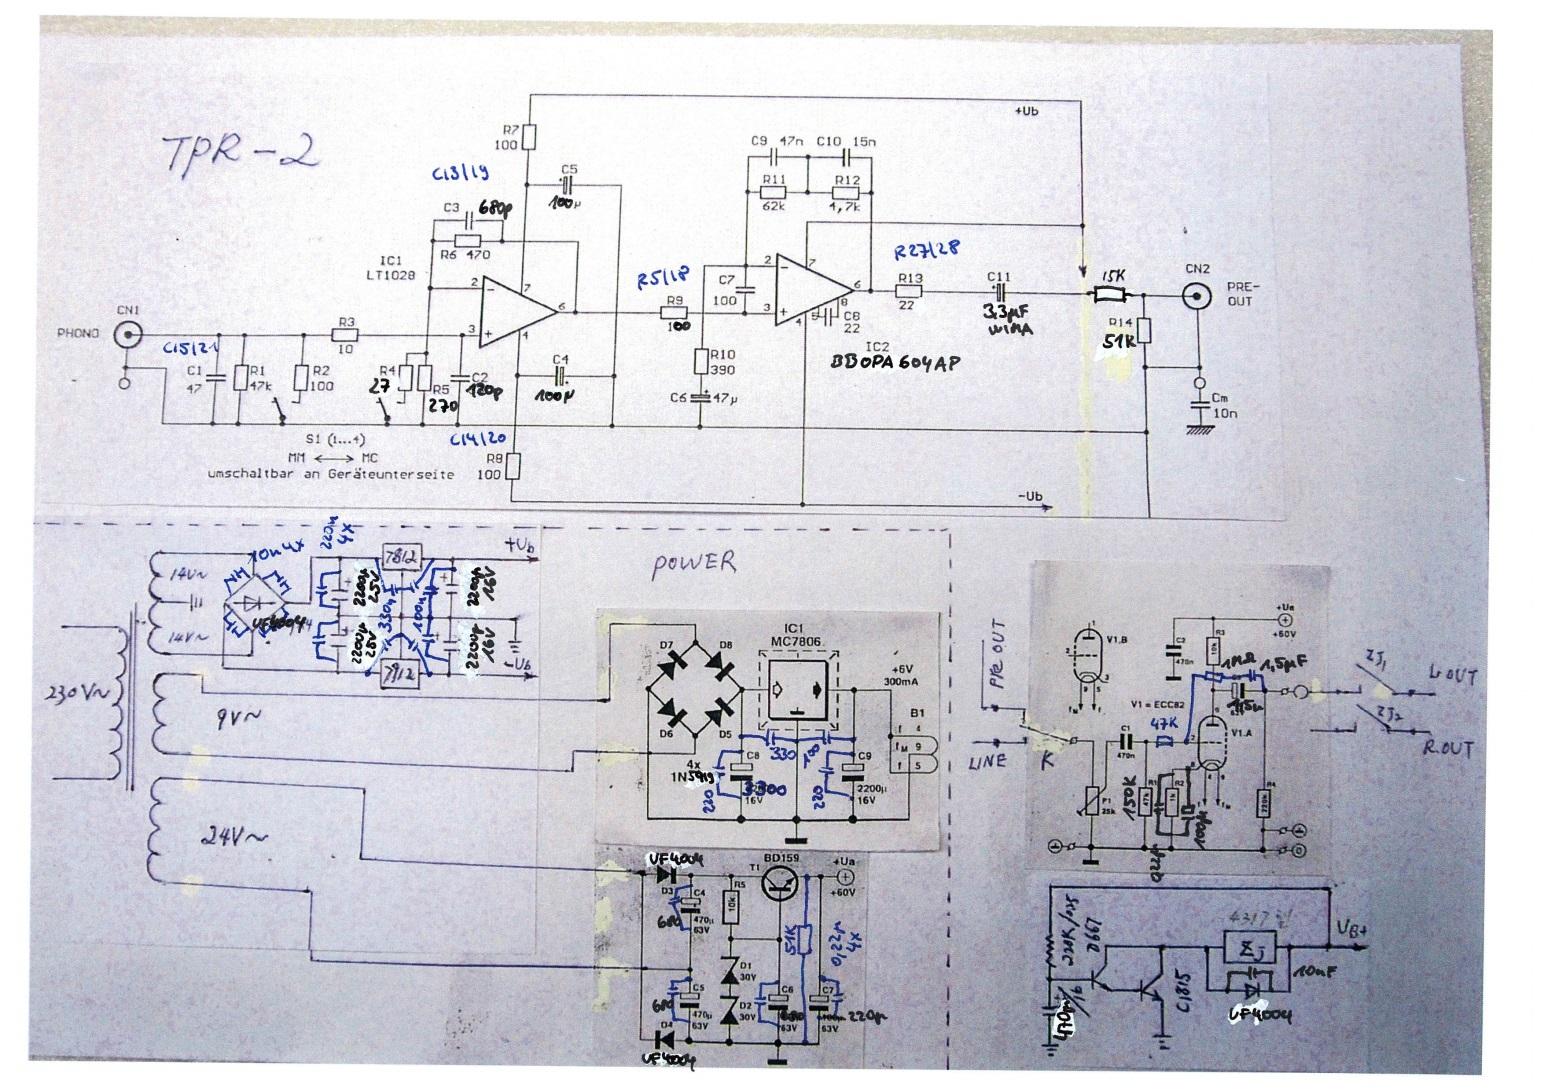 Dynavox TPR-2, Röhrengeräte - HIFI-FORUM (Seite 8)